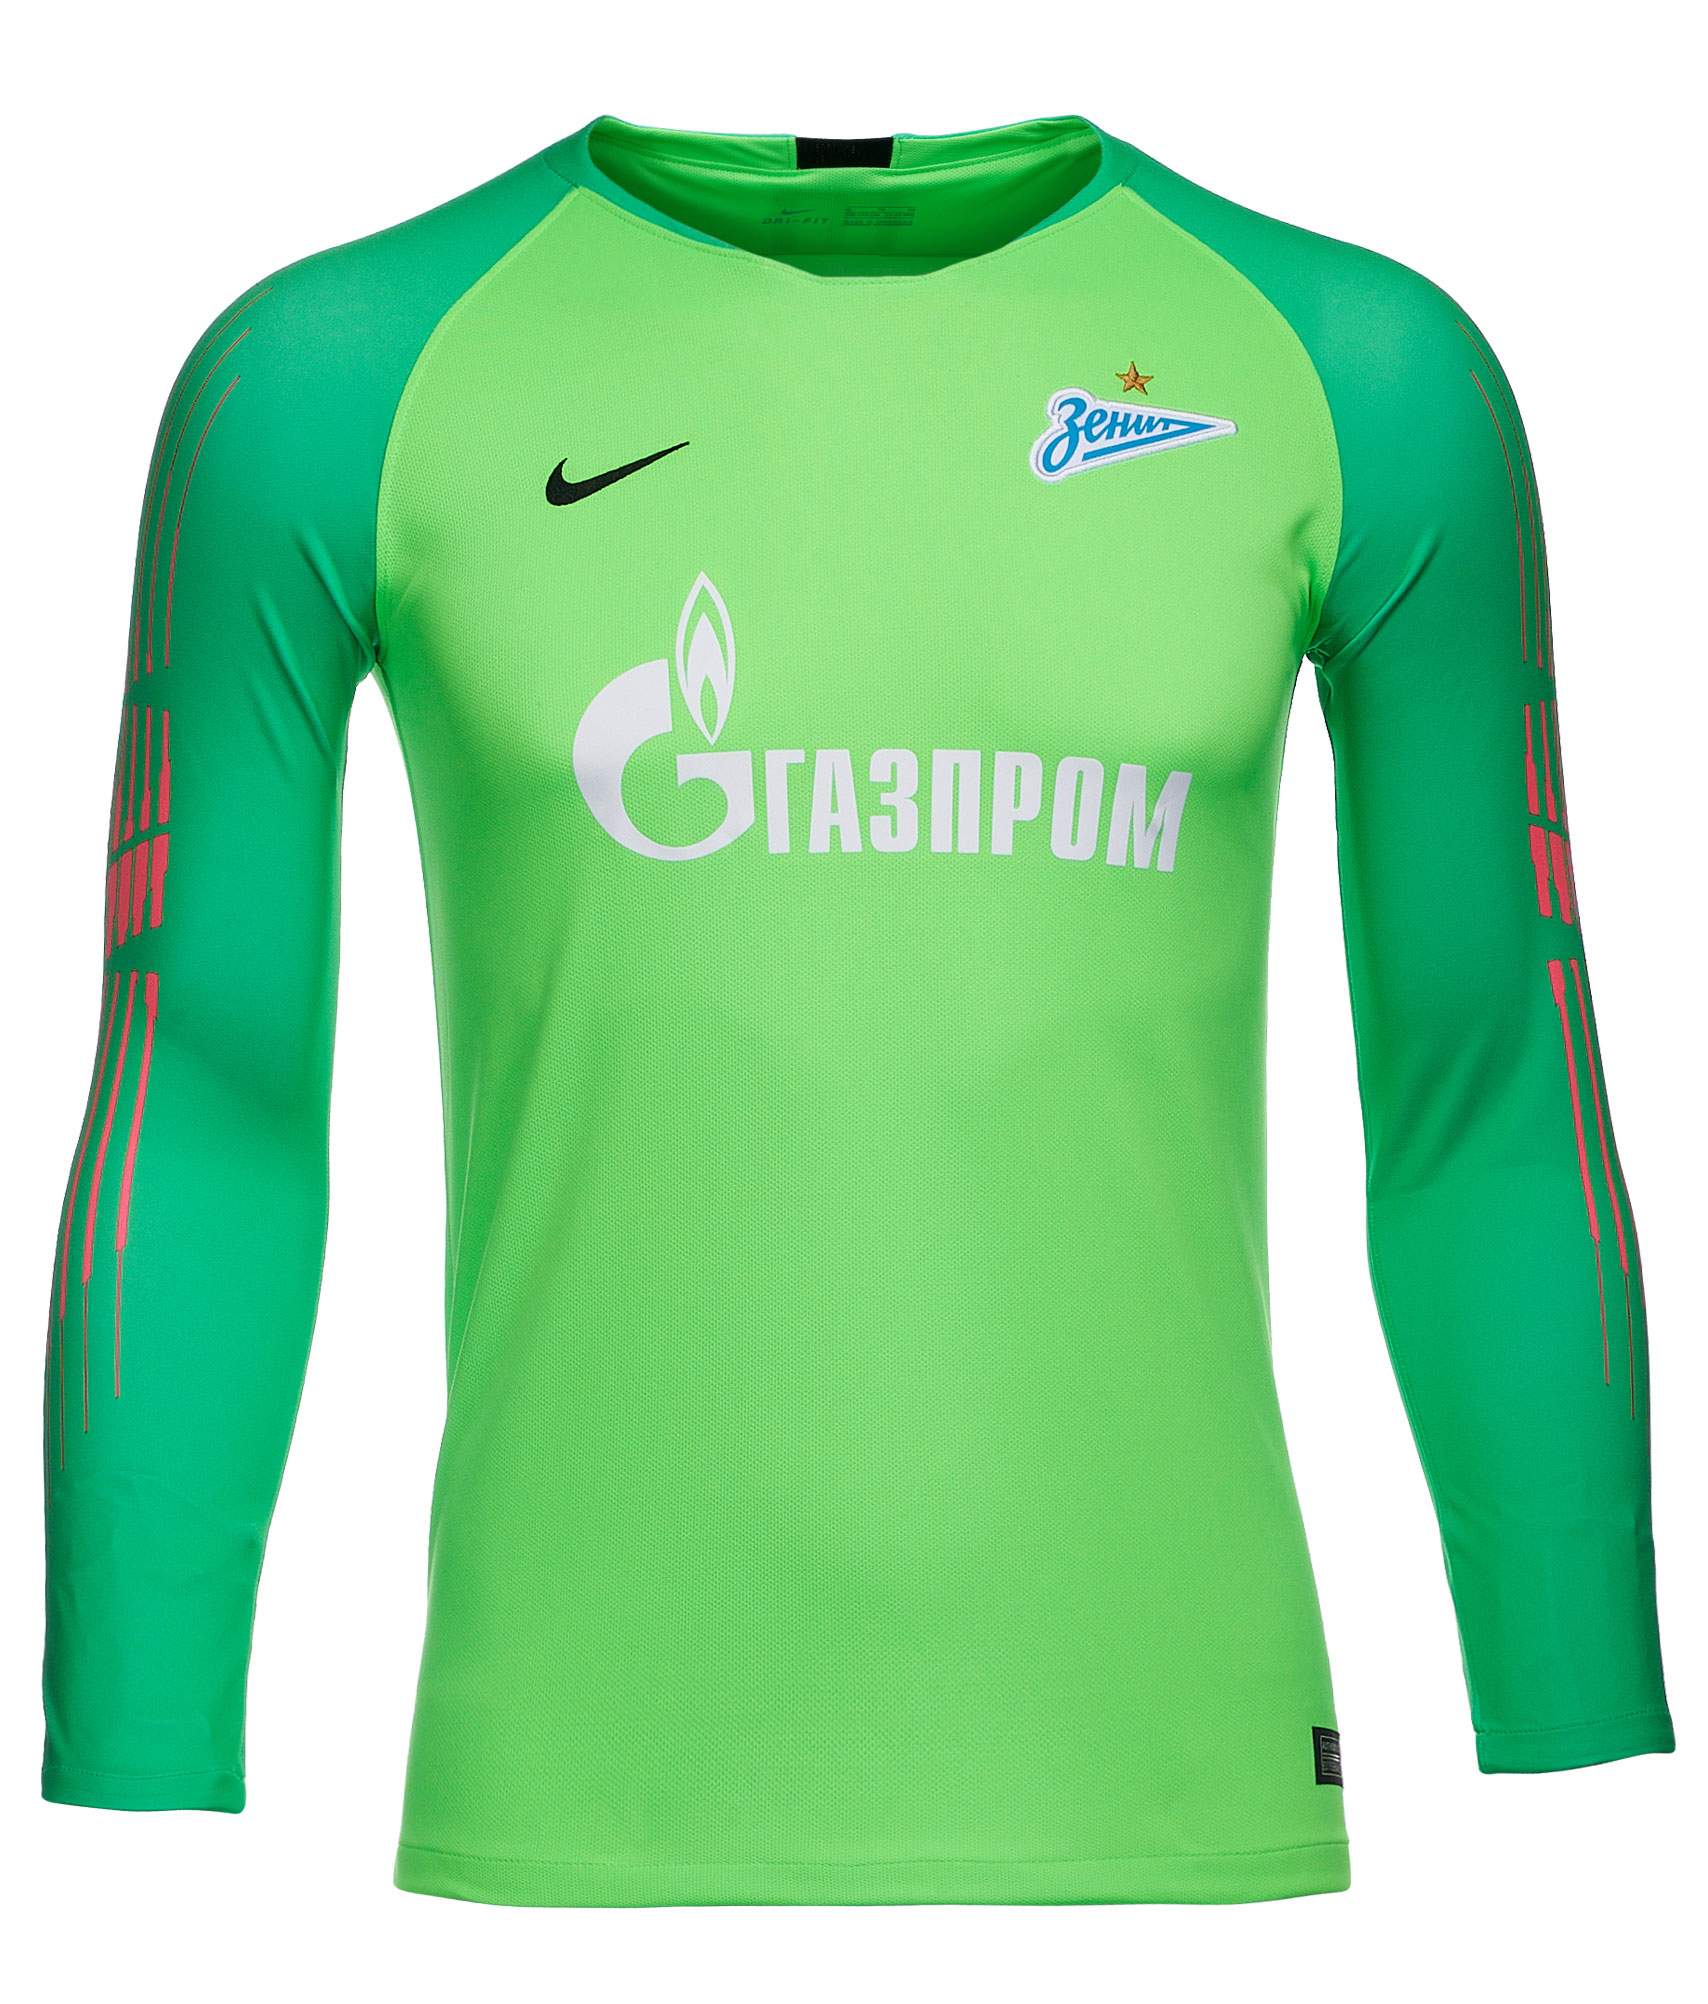 Футболка вратарская подростковая сезона 2018/2019 Nike Цвет-Зеленый